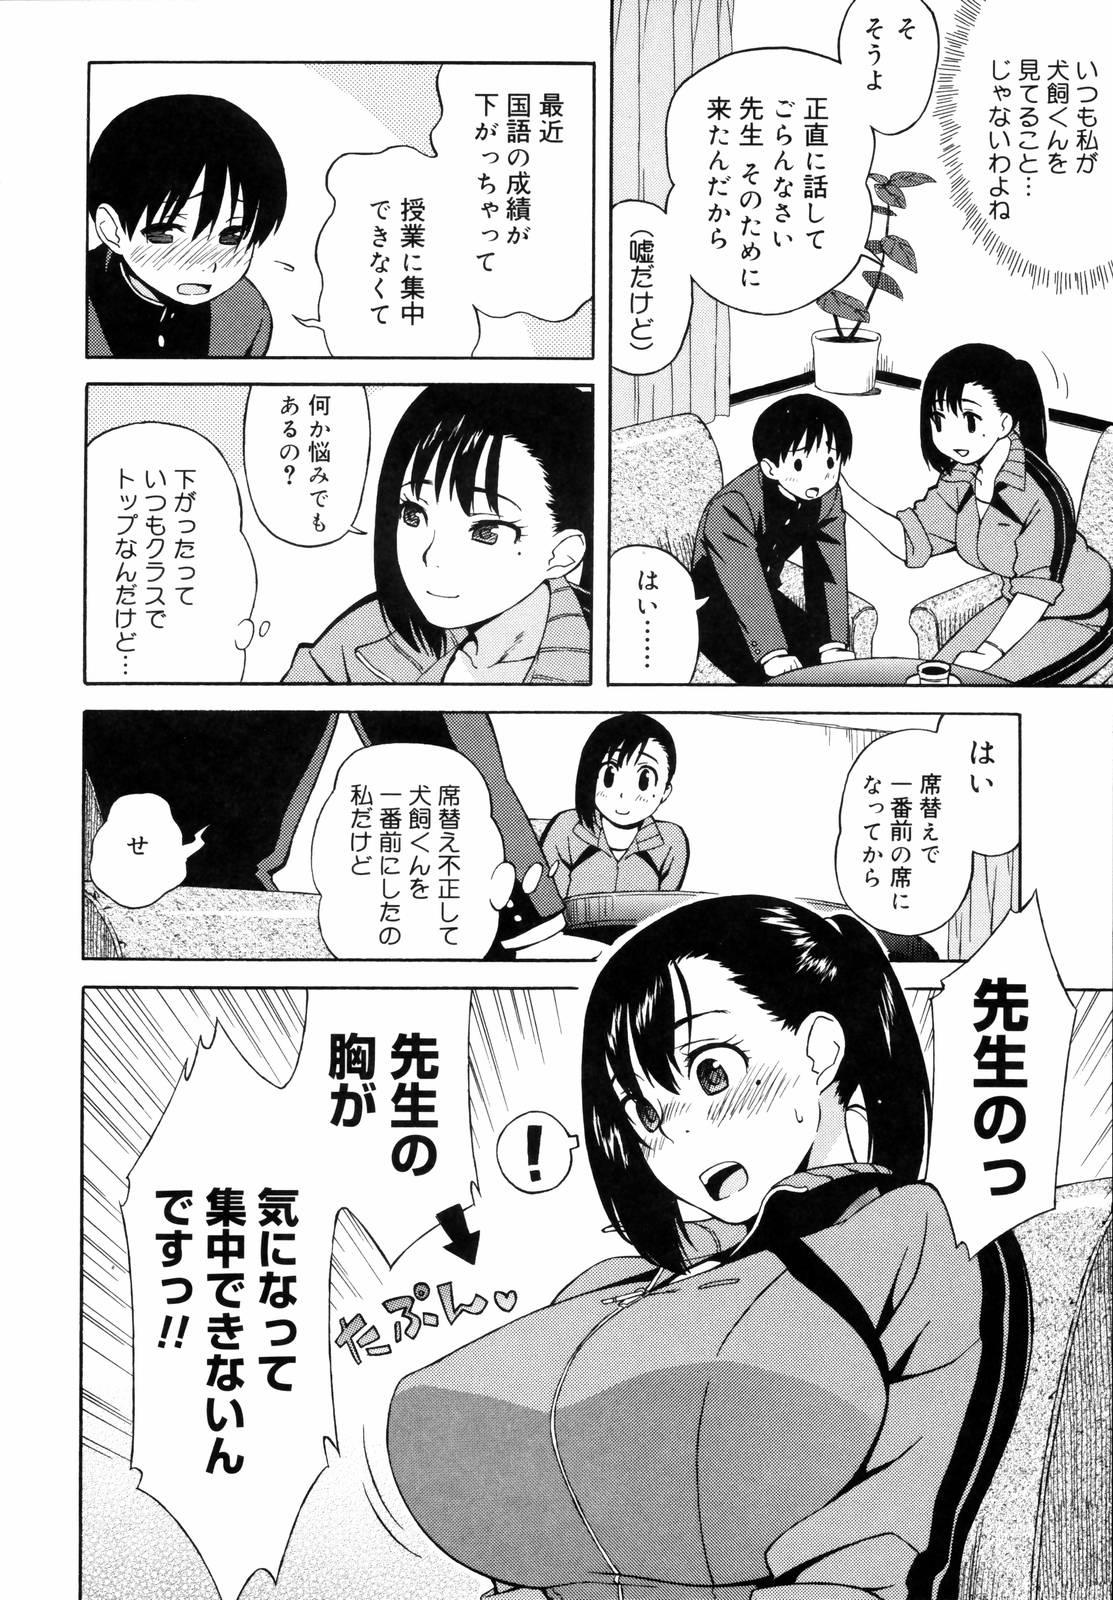 Shishunki wa Hatsujouki - Adolescence is a sexual excitement period. 113